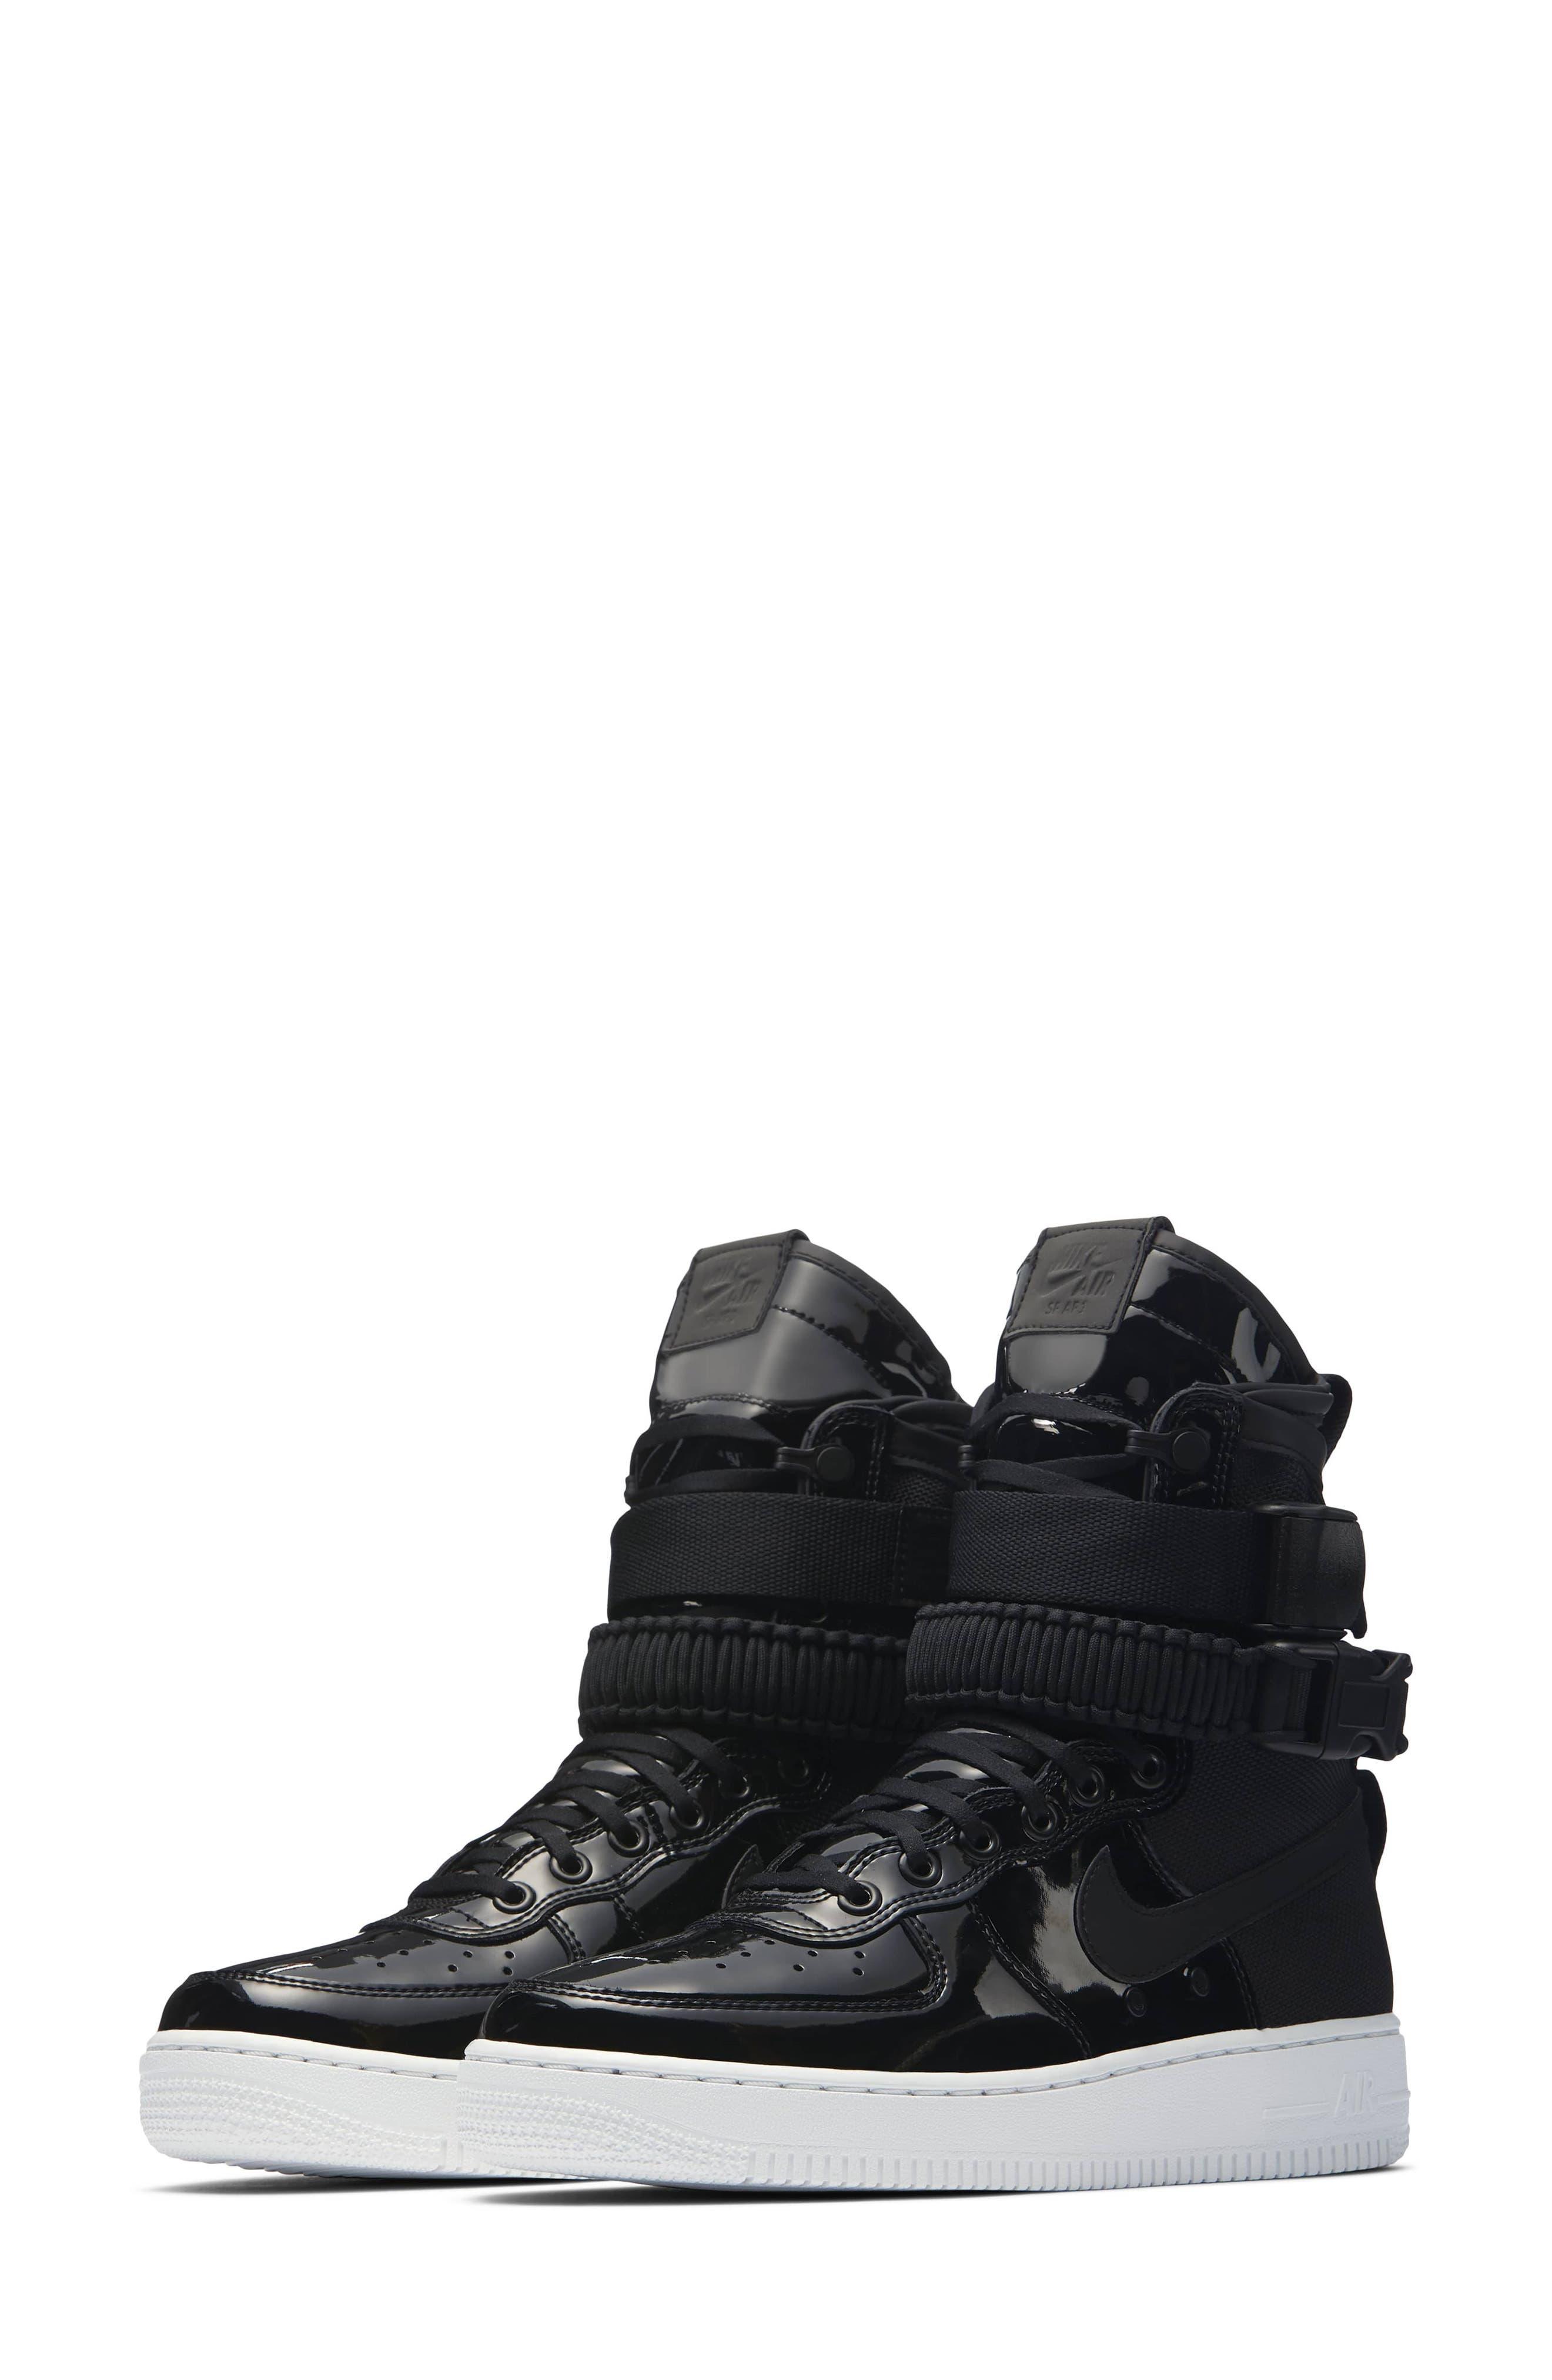 Alternate Image 1 Selected - Nike SF Air Force 1 High Top Sneaker (Women)